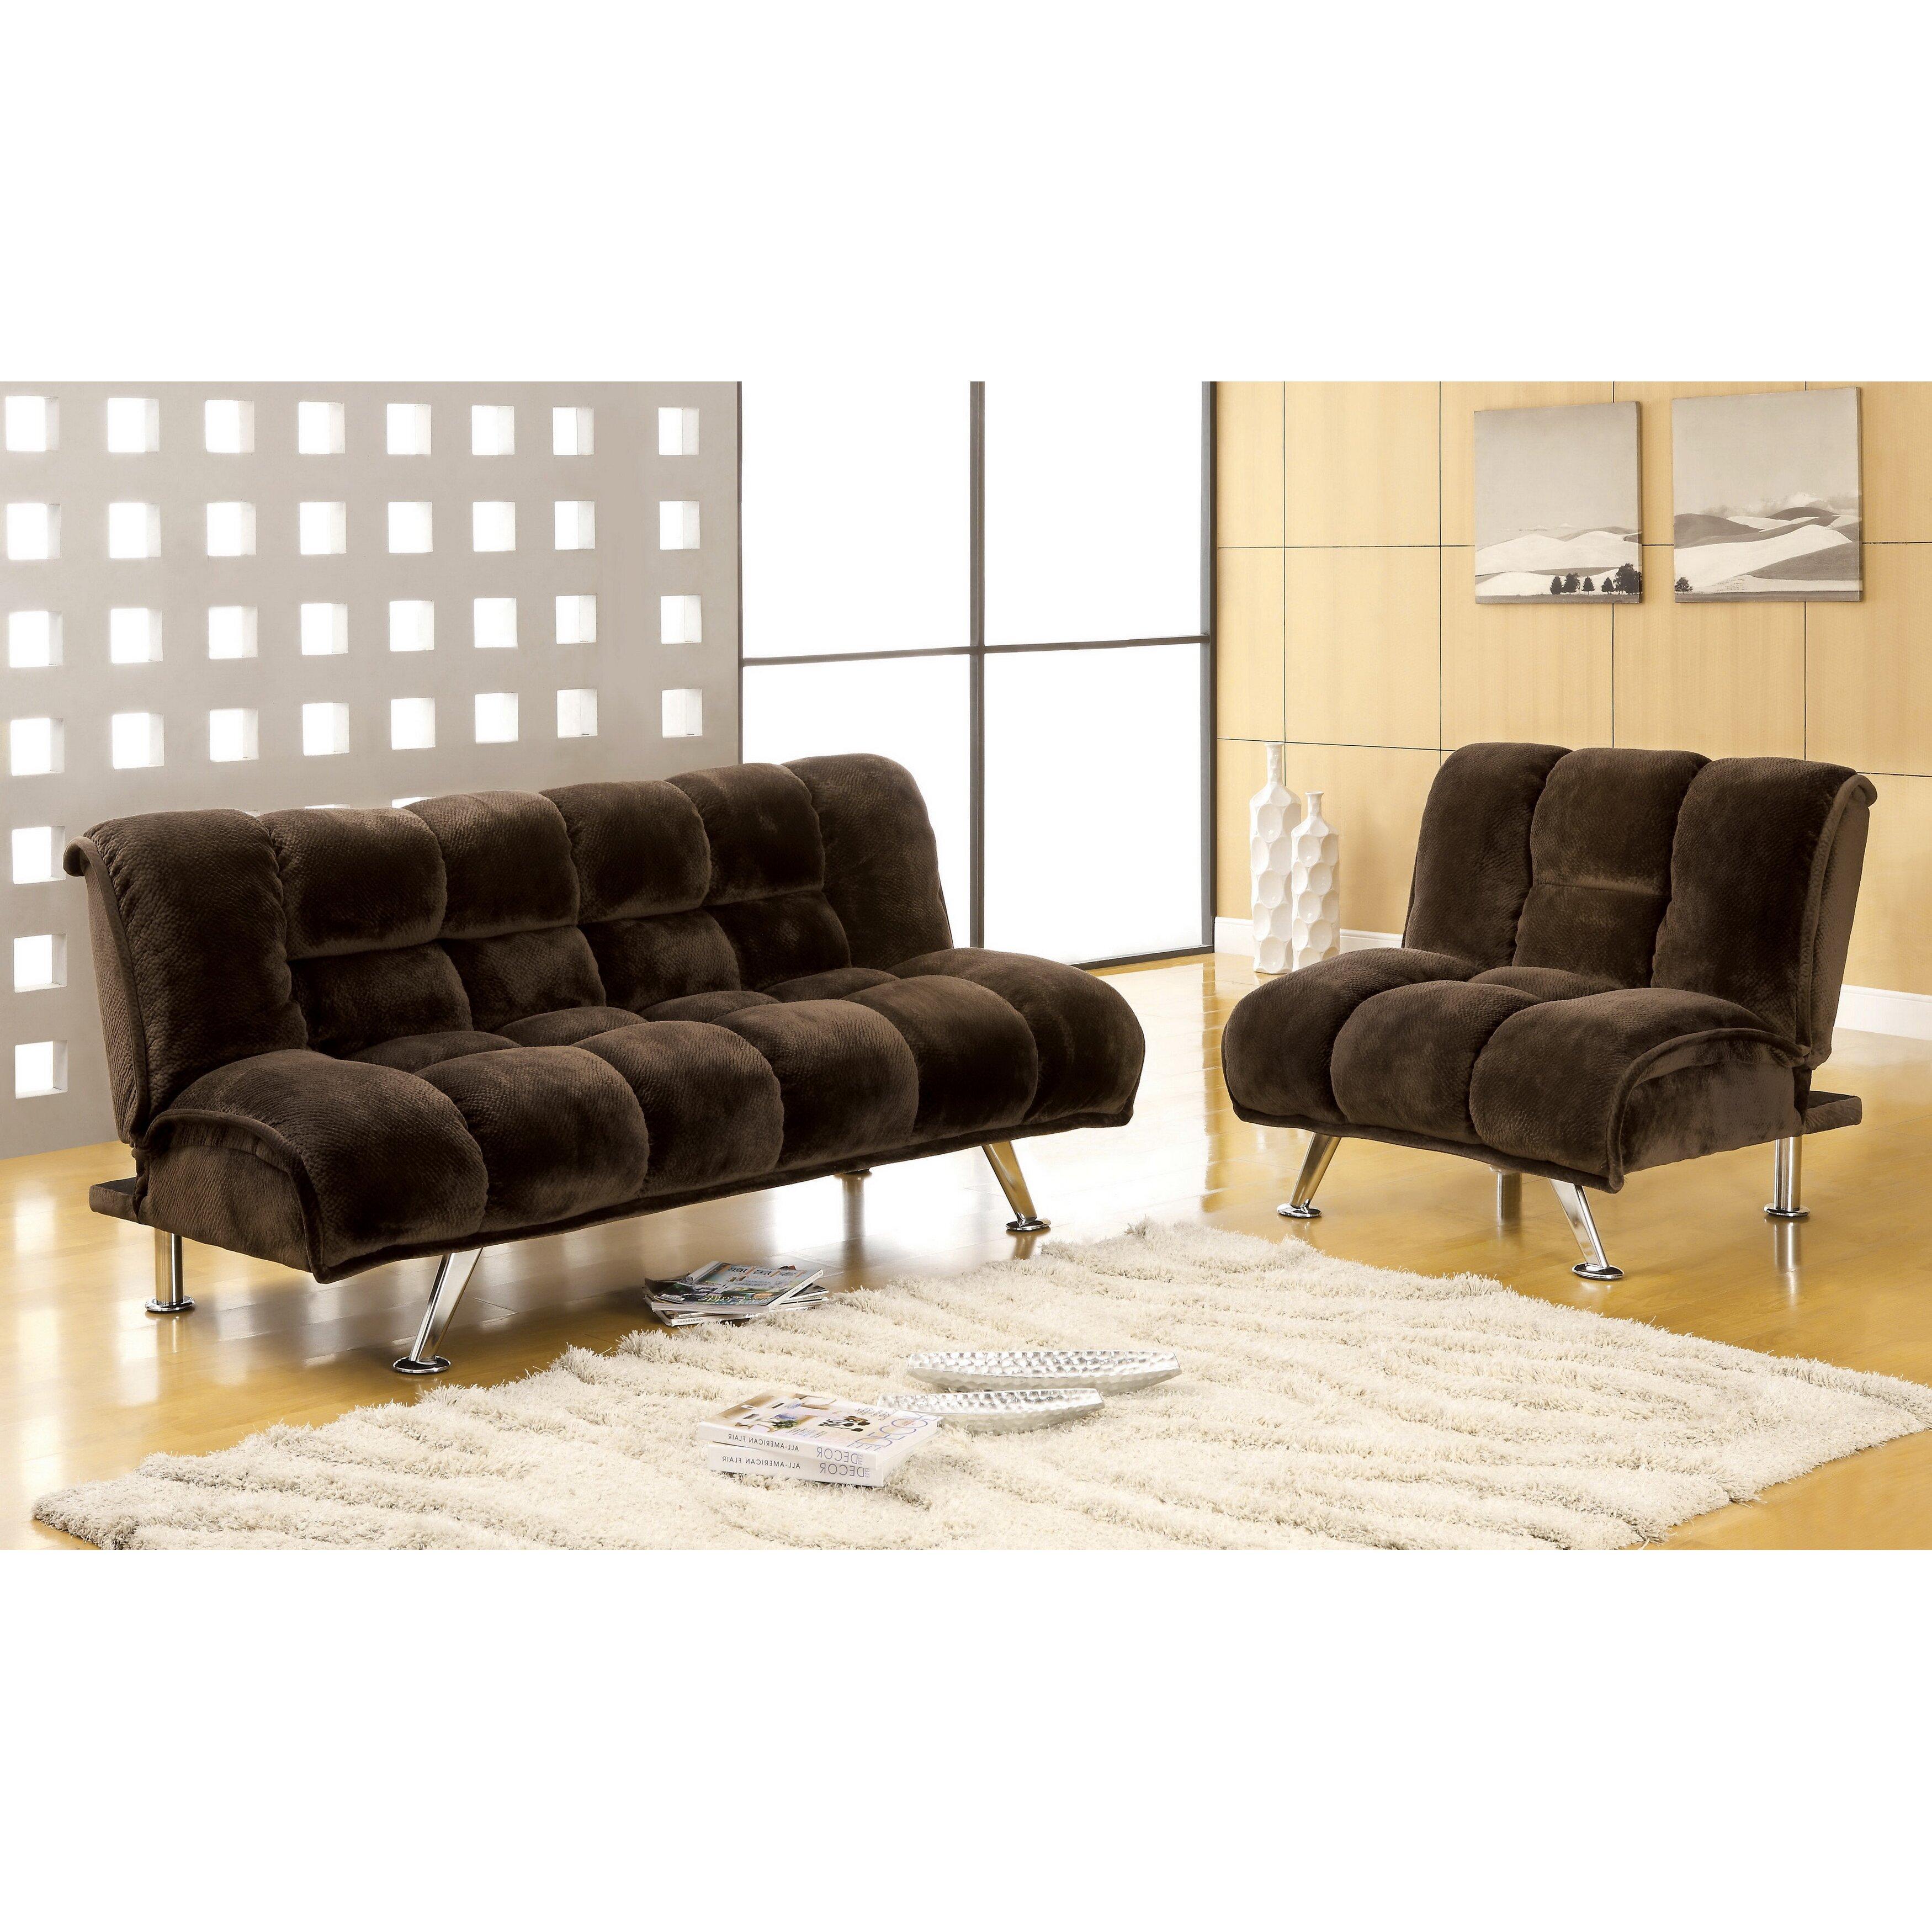 Hokku Designs Jopelli Flannel Sleeper Sofa And Chair Set Reviews Wayfair